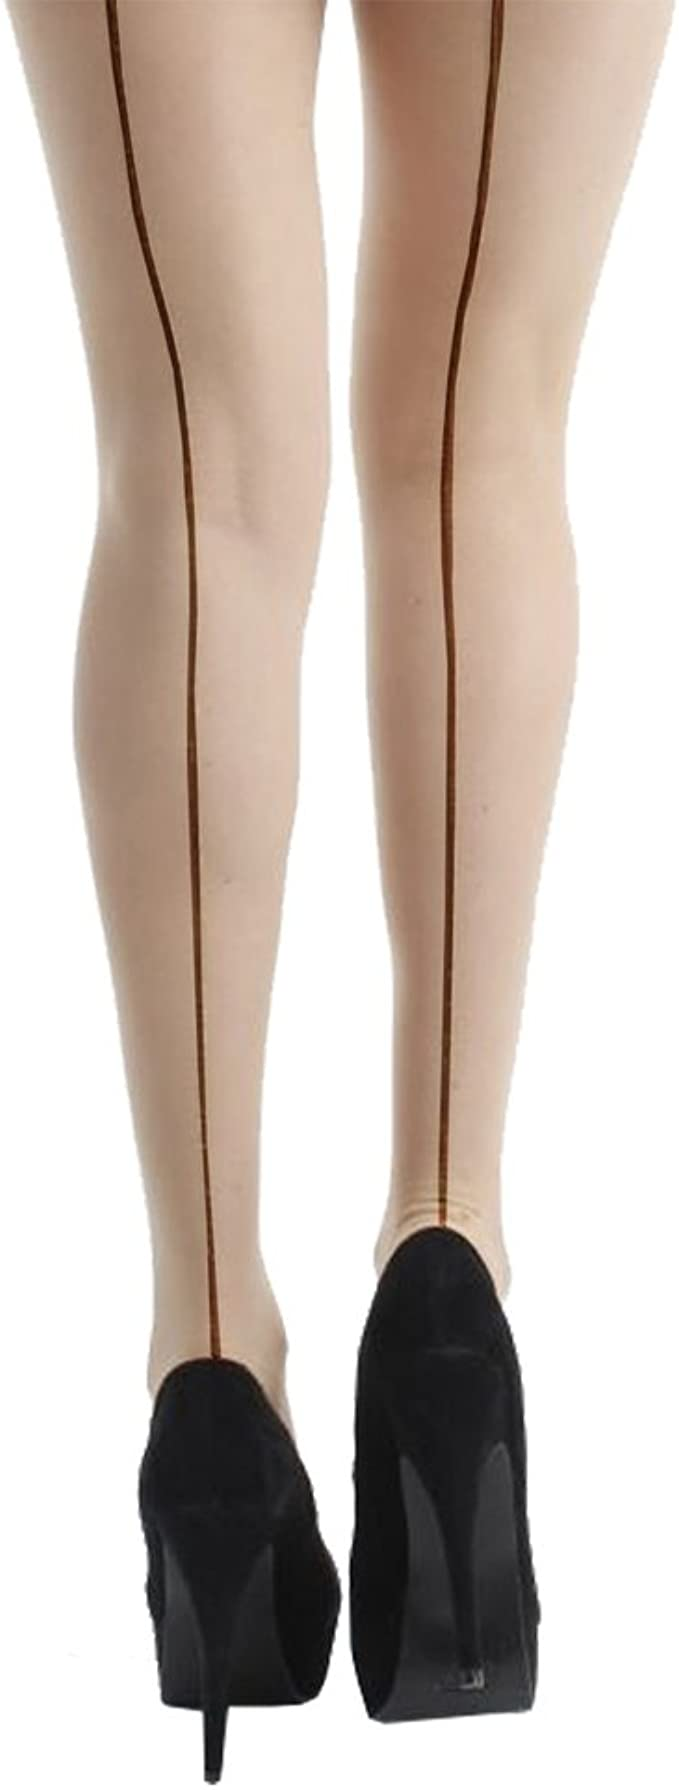 15 denari cucitura retro SEAMED Calze con tacco cubano Burlesque Da Pretty Legs